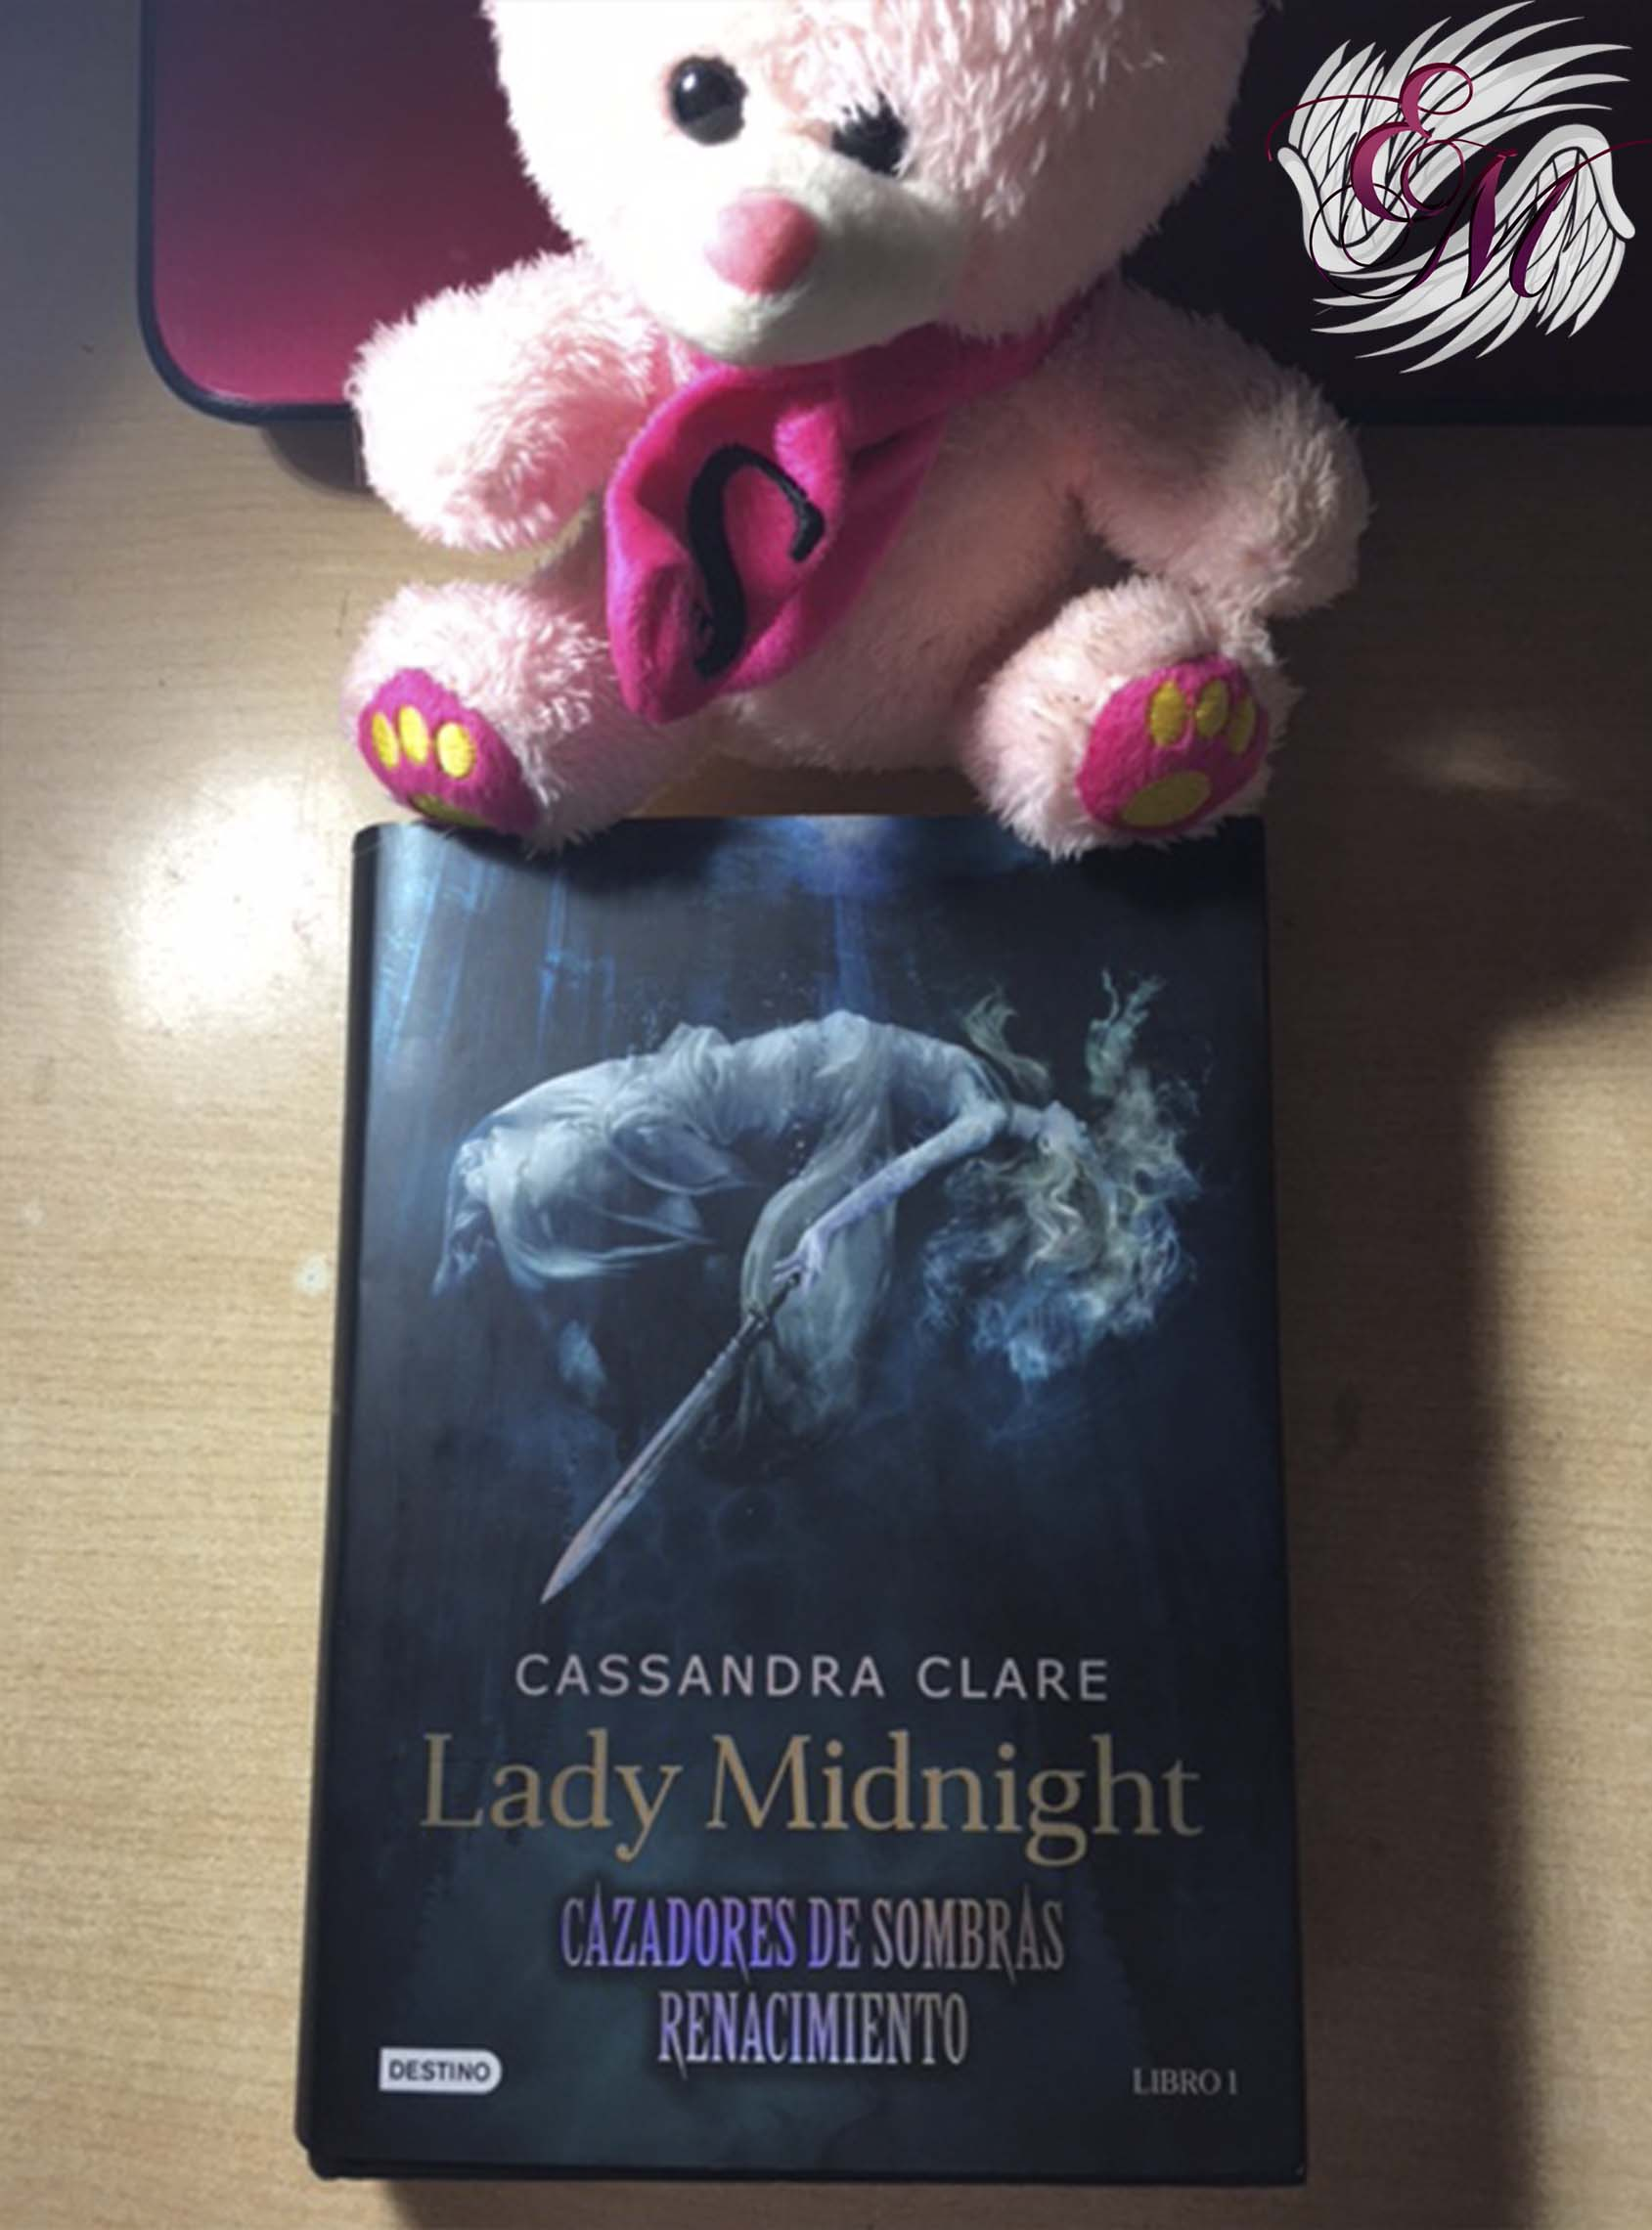 Lady Midnight, de Cassandra Clare - Reseña